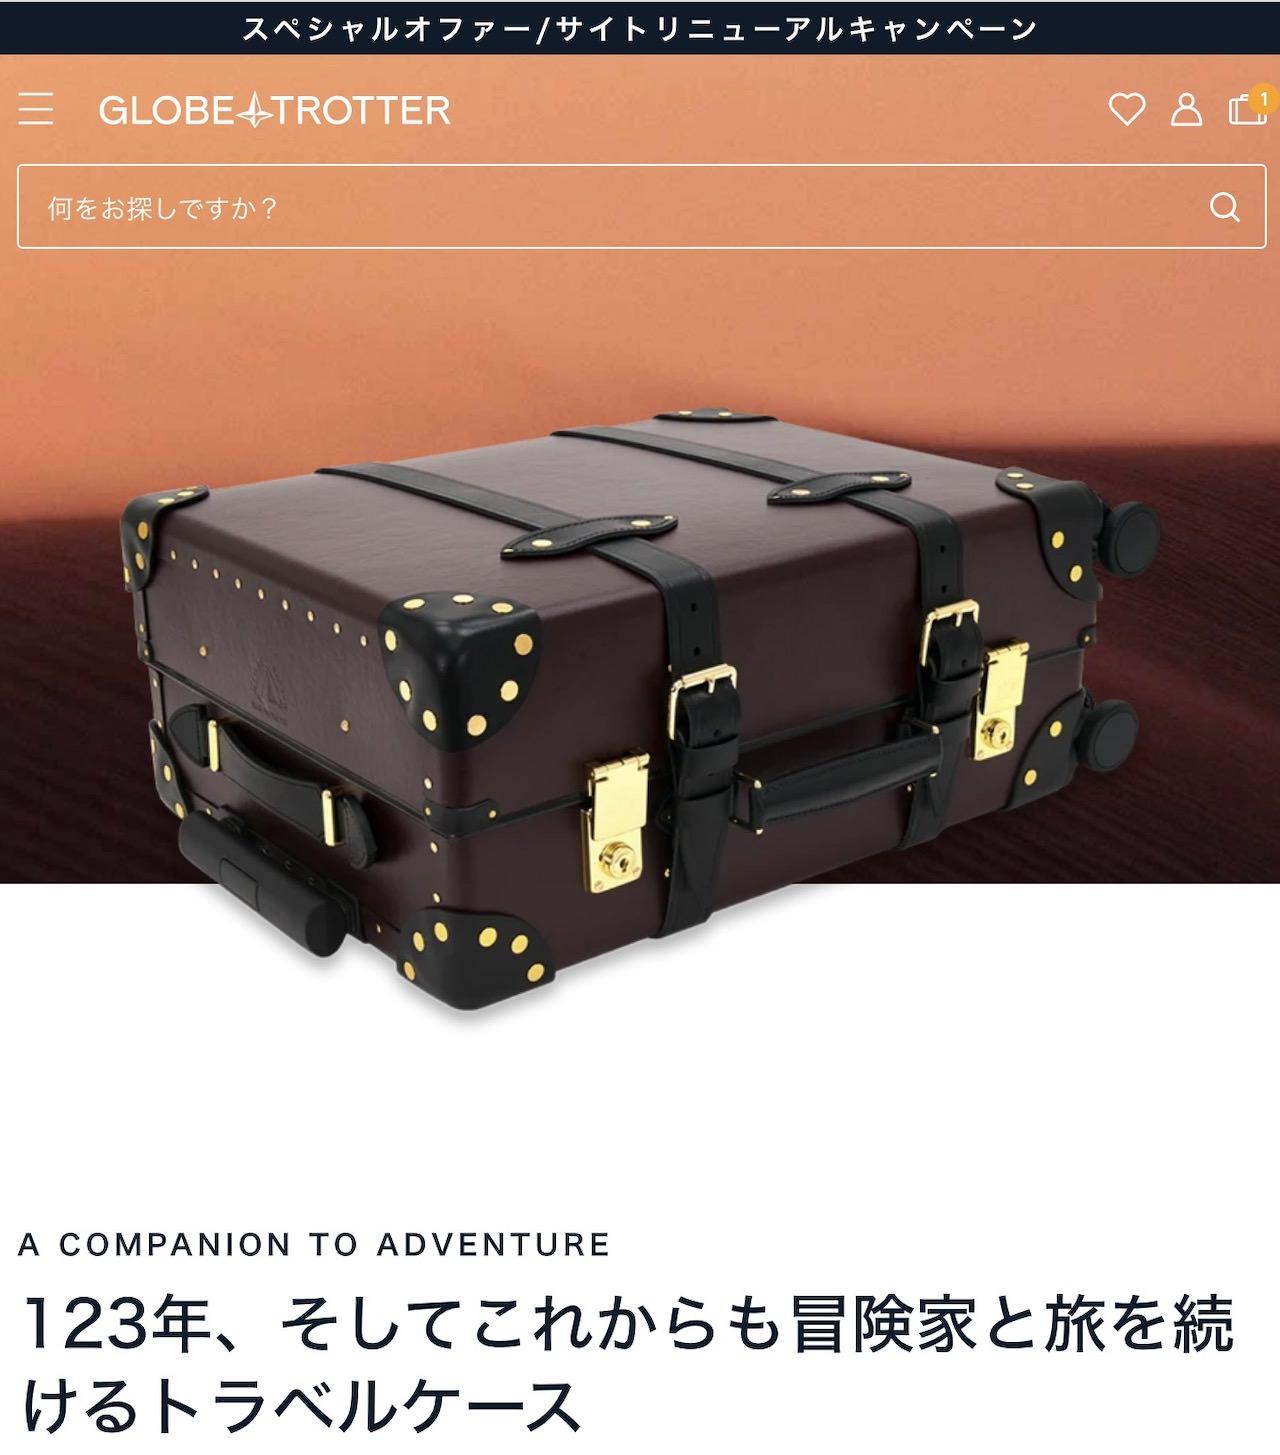 globe-trotter-10%_01